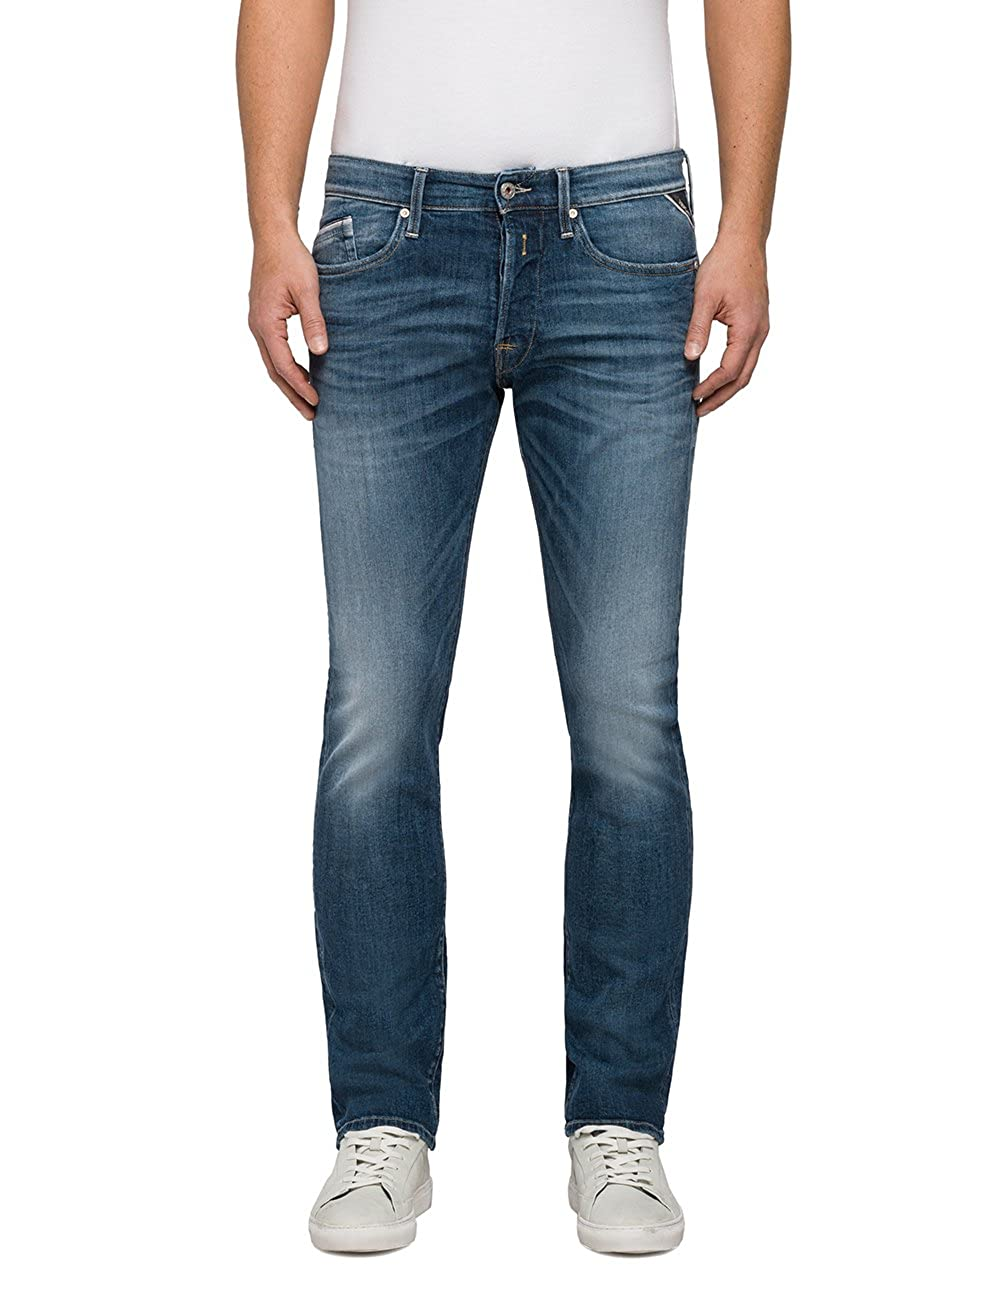 TALLA 32W / 34L. REPLAY Waitom Jeans Rectos para Hombre